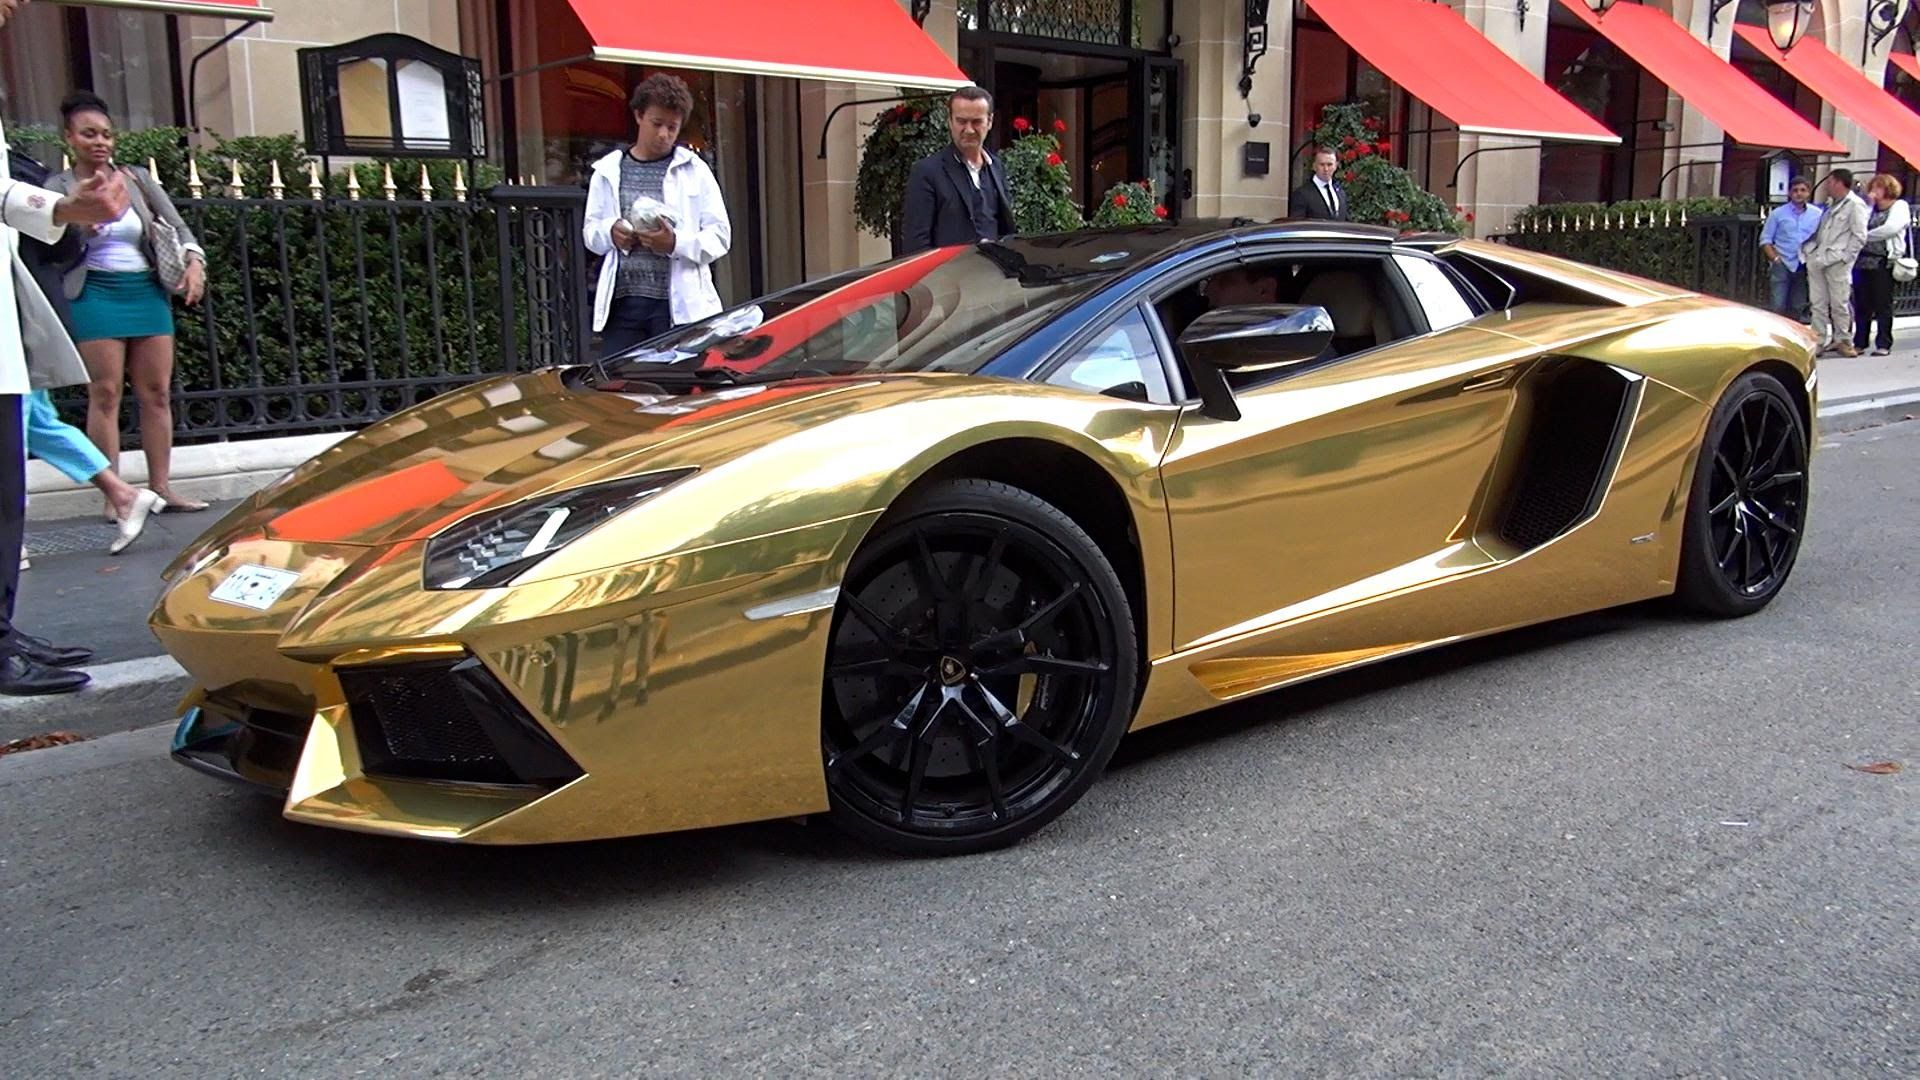 gold lamborghini aventador roadster loud driving pursuit - Lamborghini Aventador Gold And Black